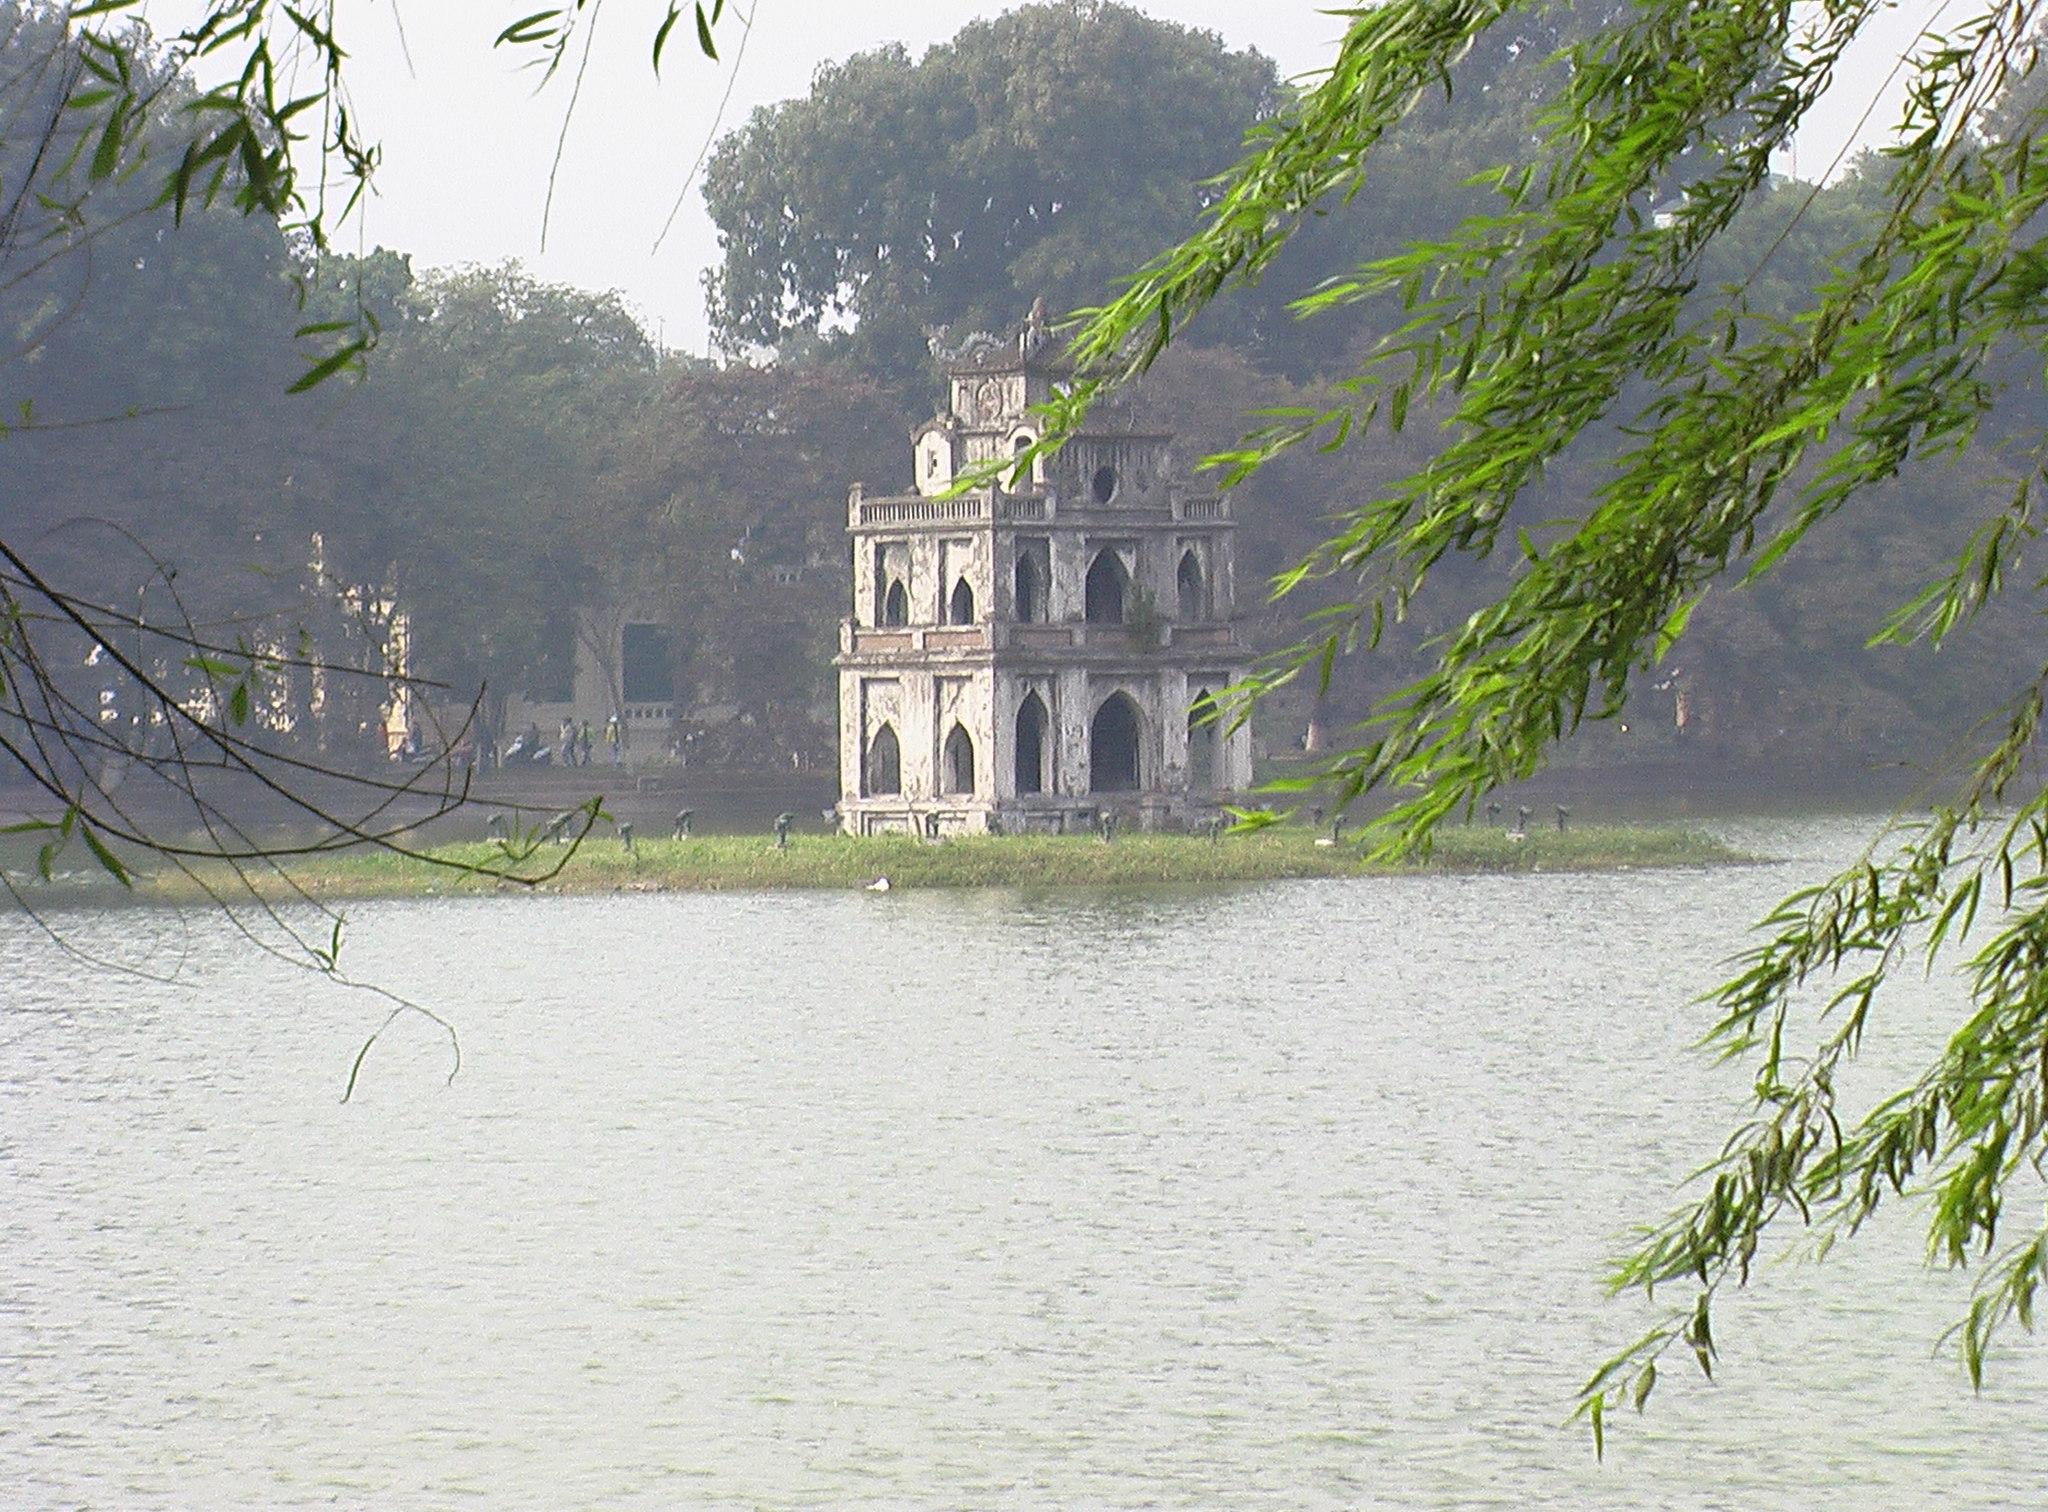 walking around hoan kiem lake sword lake hanoi vietnam 4